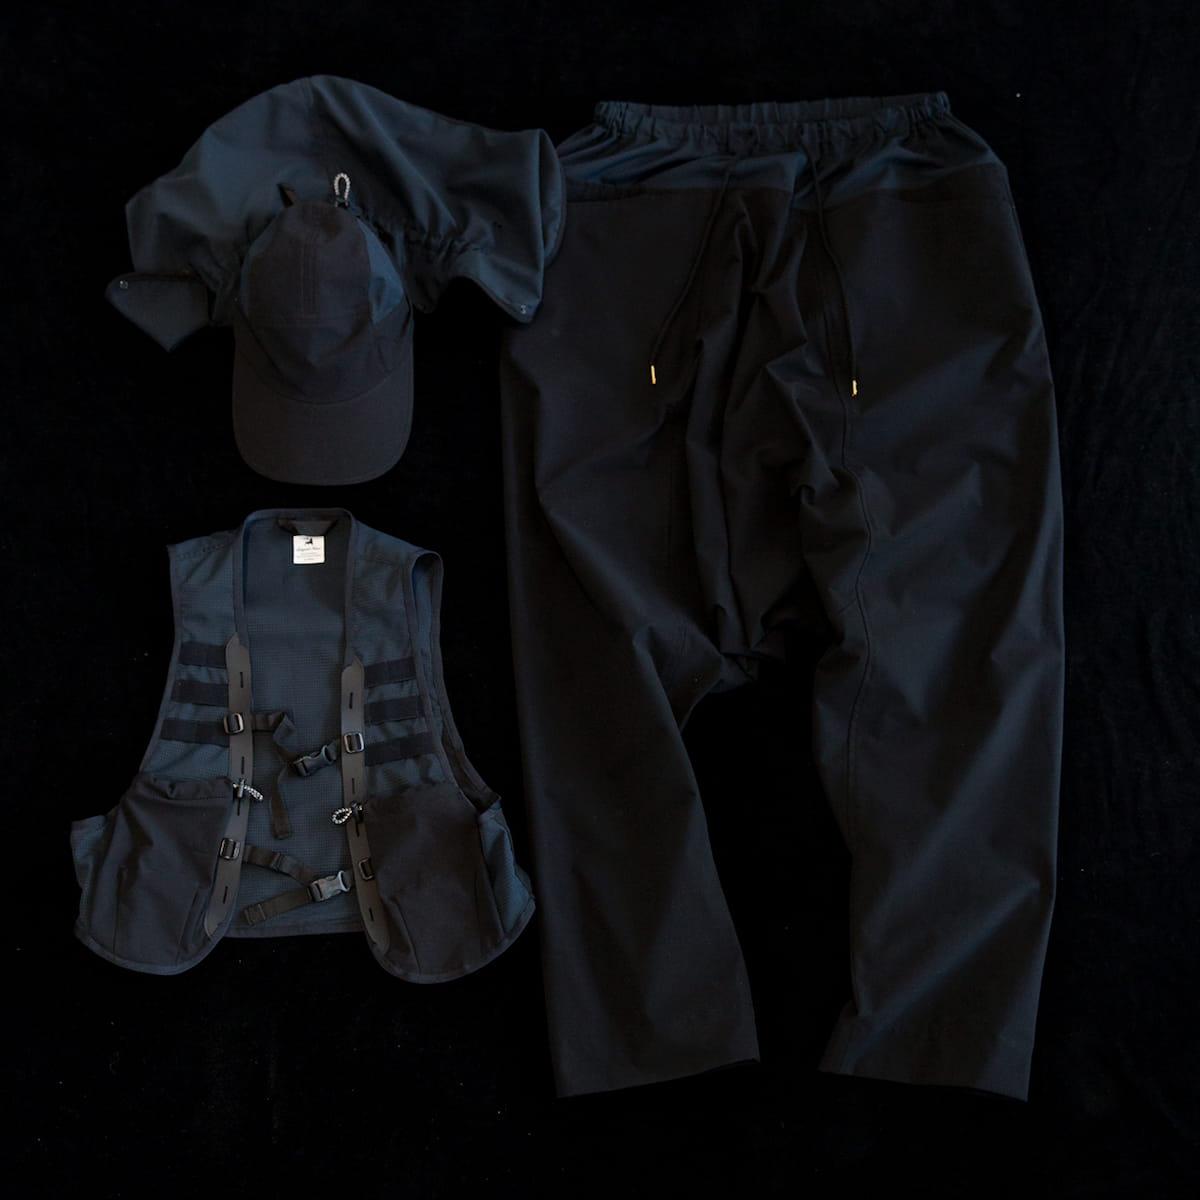 Sasquatchfabrix.×Ninja Tune×BEAMSトリプルネームによるコラボレーションウェアを発表 life_fashion180313_sasquatchfabrix_ninjatune_beams_1-1200x1200